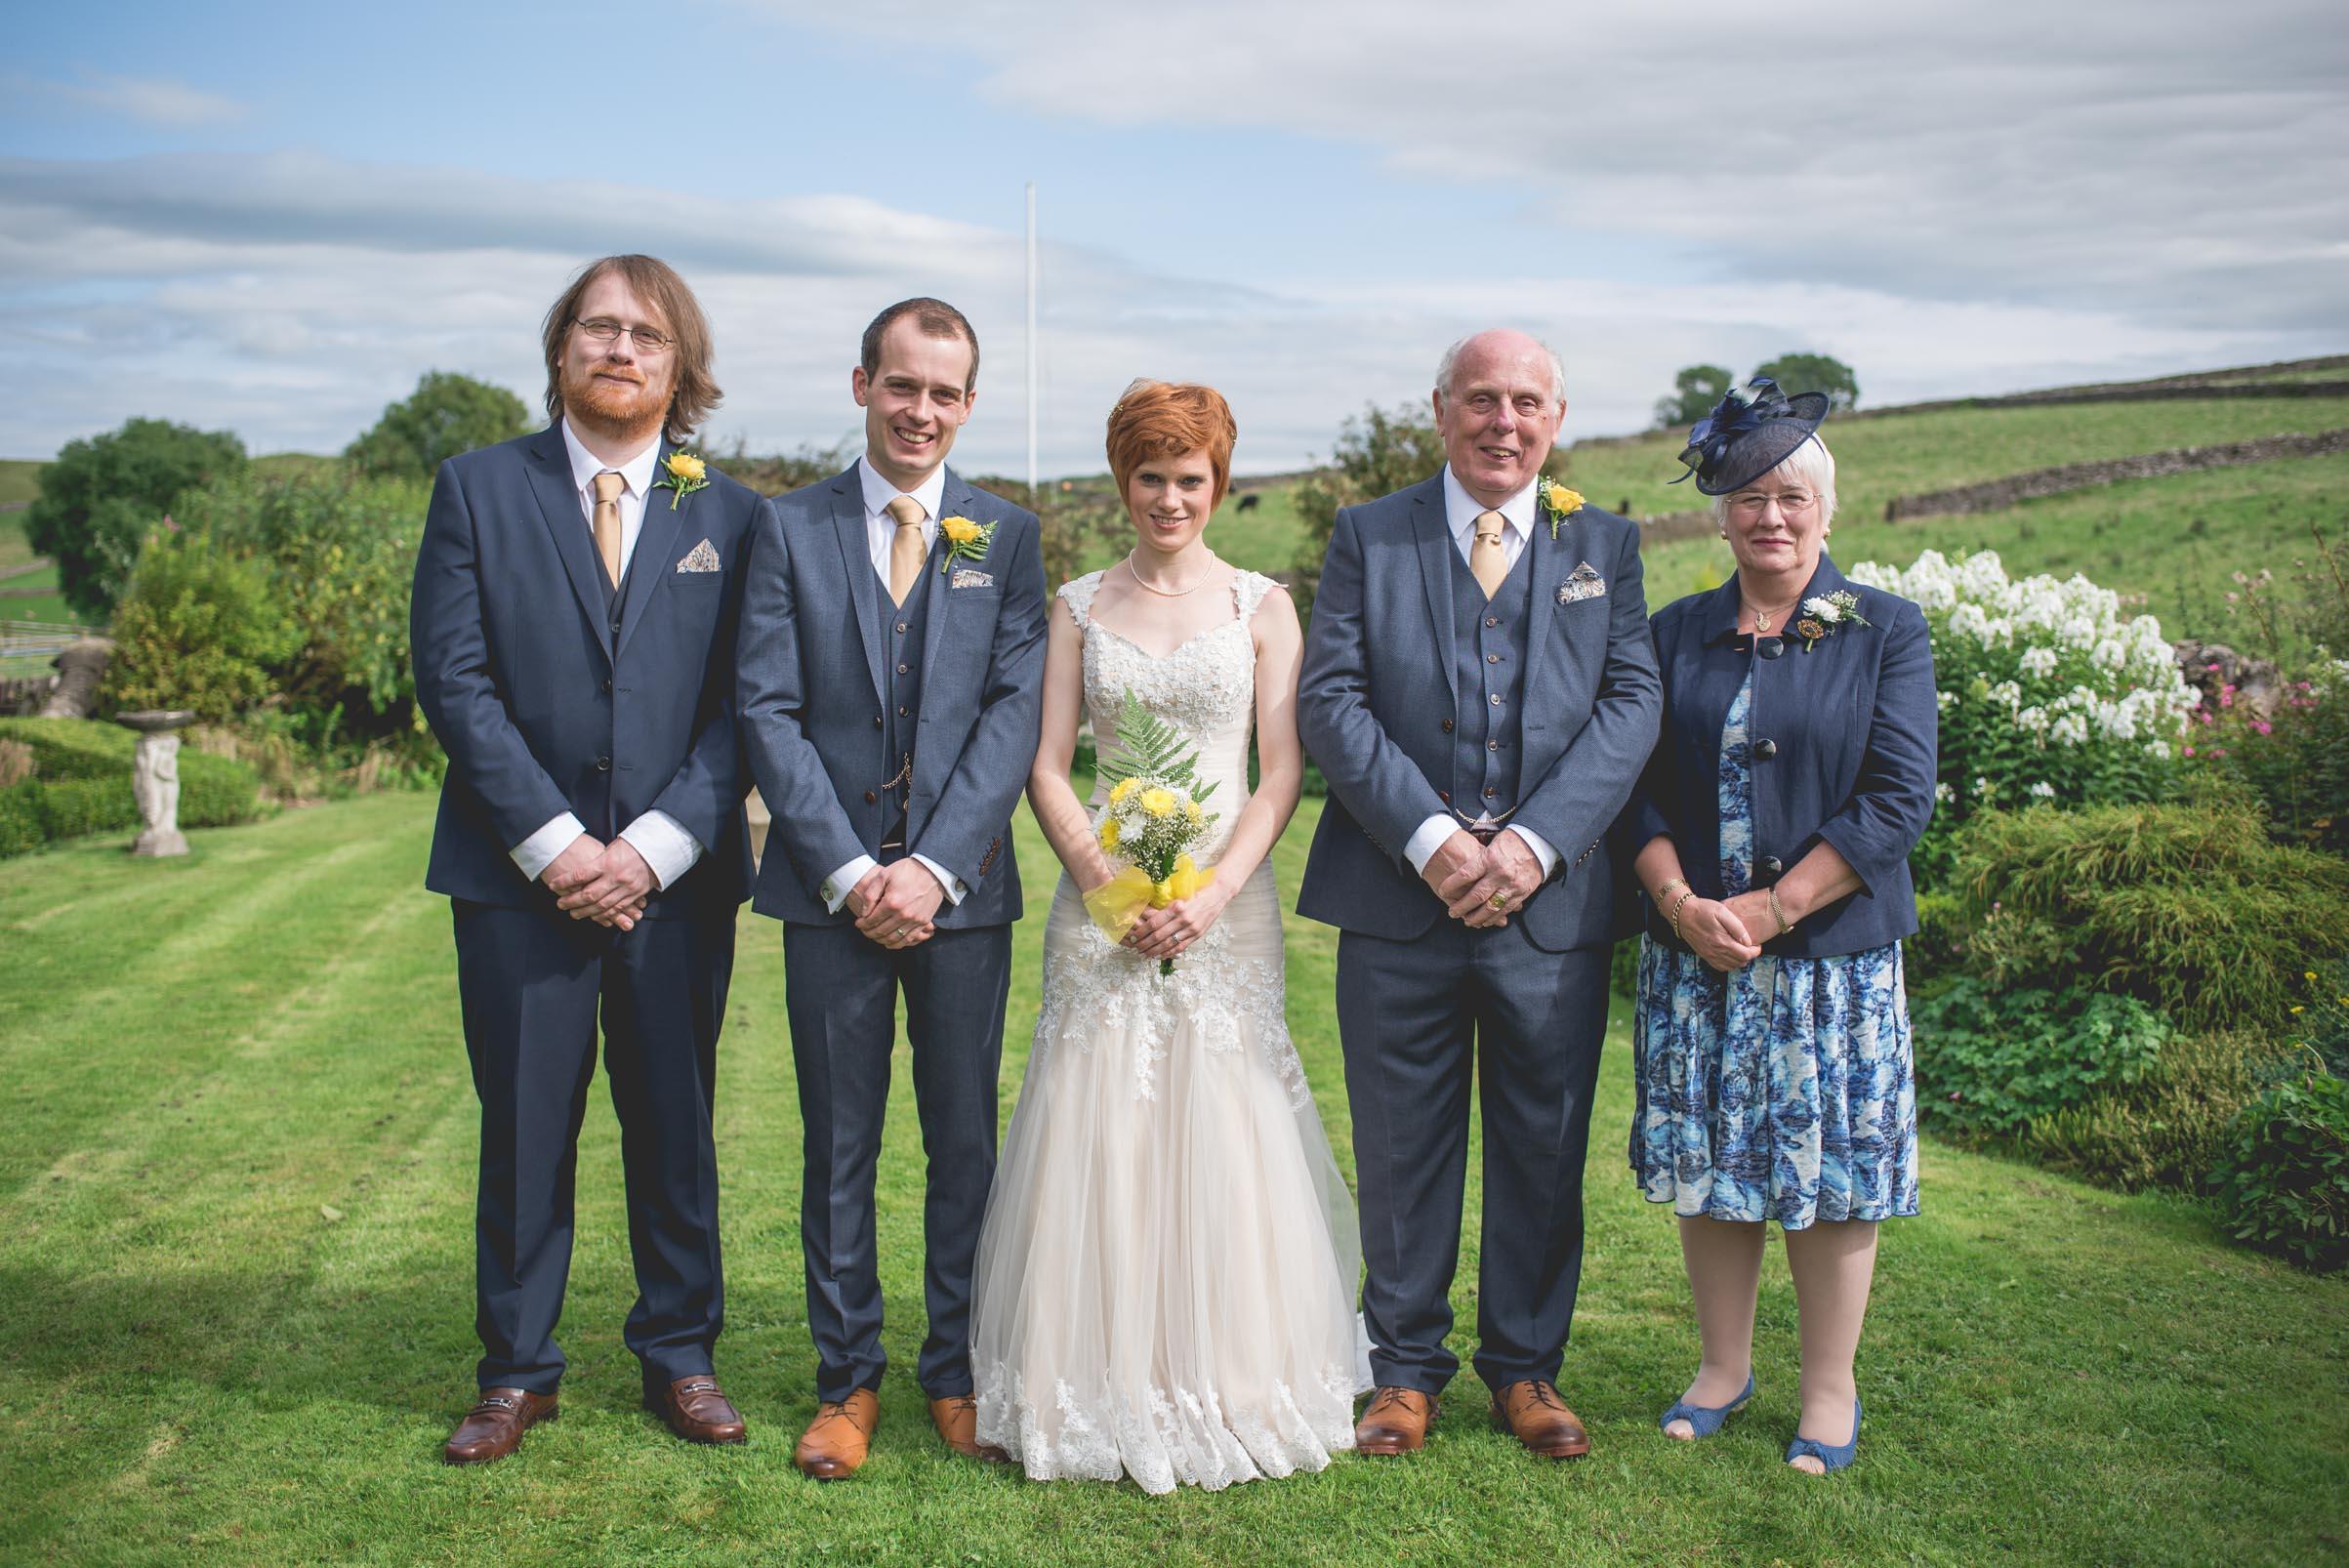 Peak+district+farm+wedding+lower+damgate+photographer-77.jpg